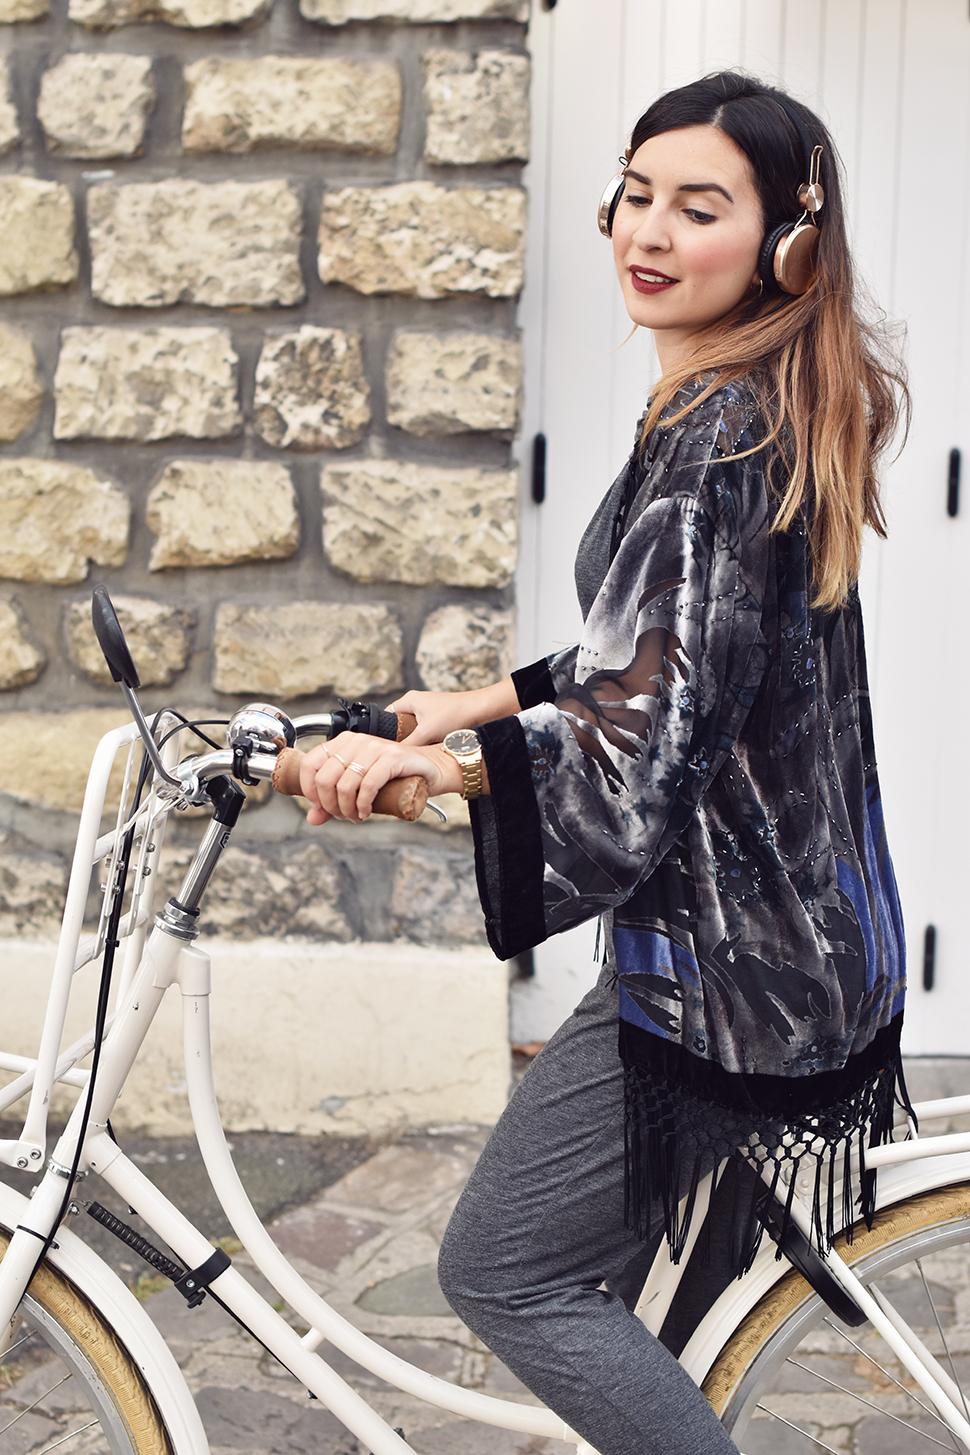 helloitsvalentine_bicycle_3